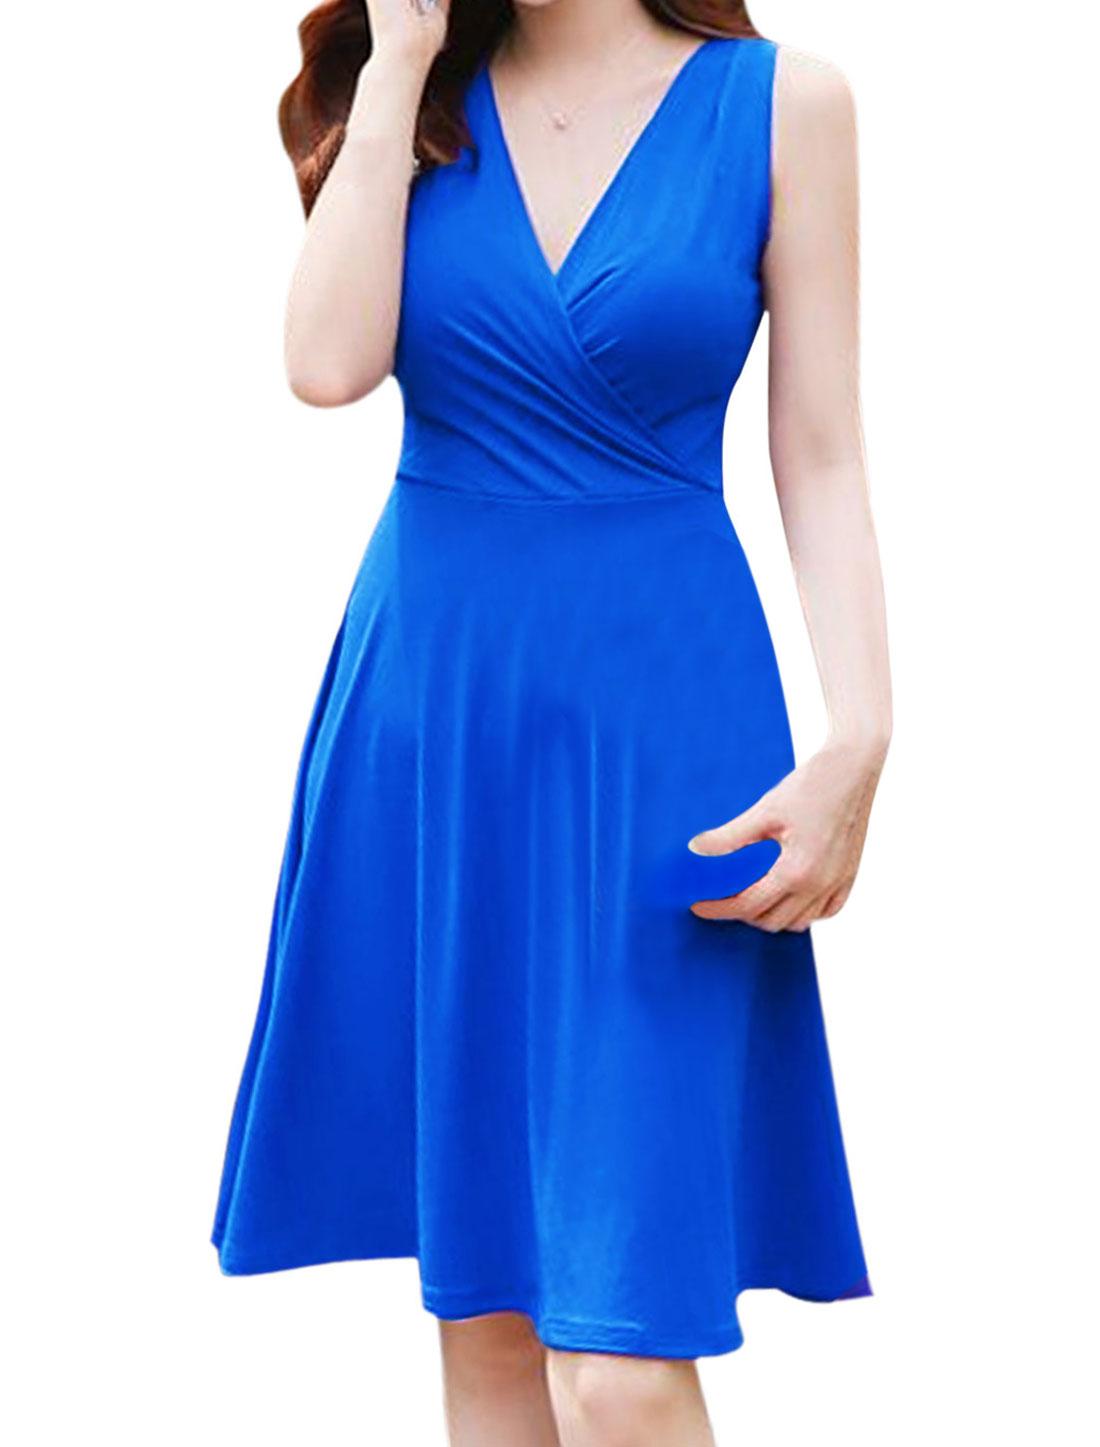 Ladies Sleeveless Crossover V Neck Unlined Dress Royal Blue M